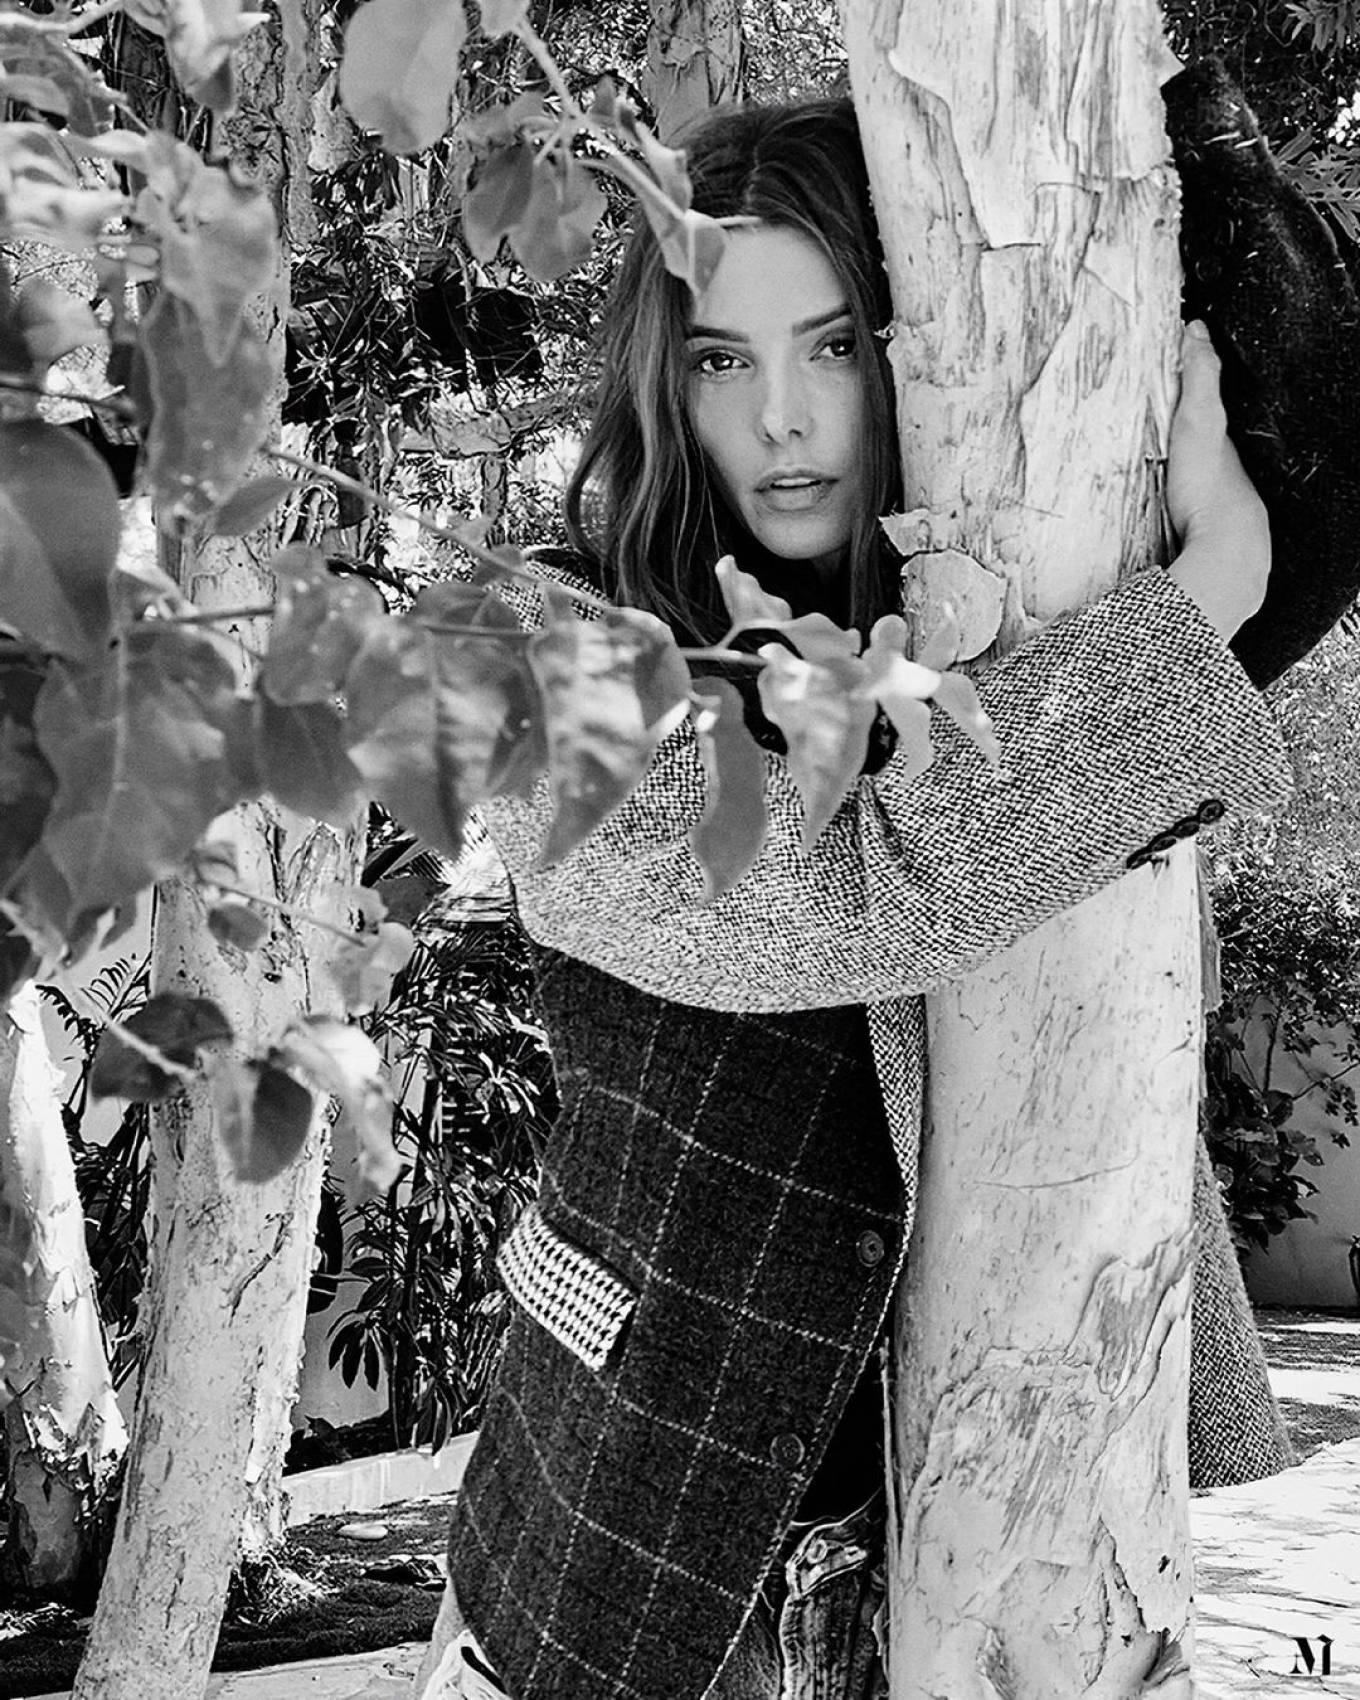 Ashley Greene 2020 : Ashley Greene – Revista de Milenio magazine (Issue 03 – 2020)-08